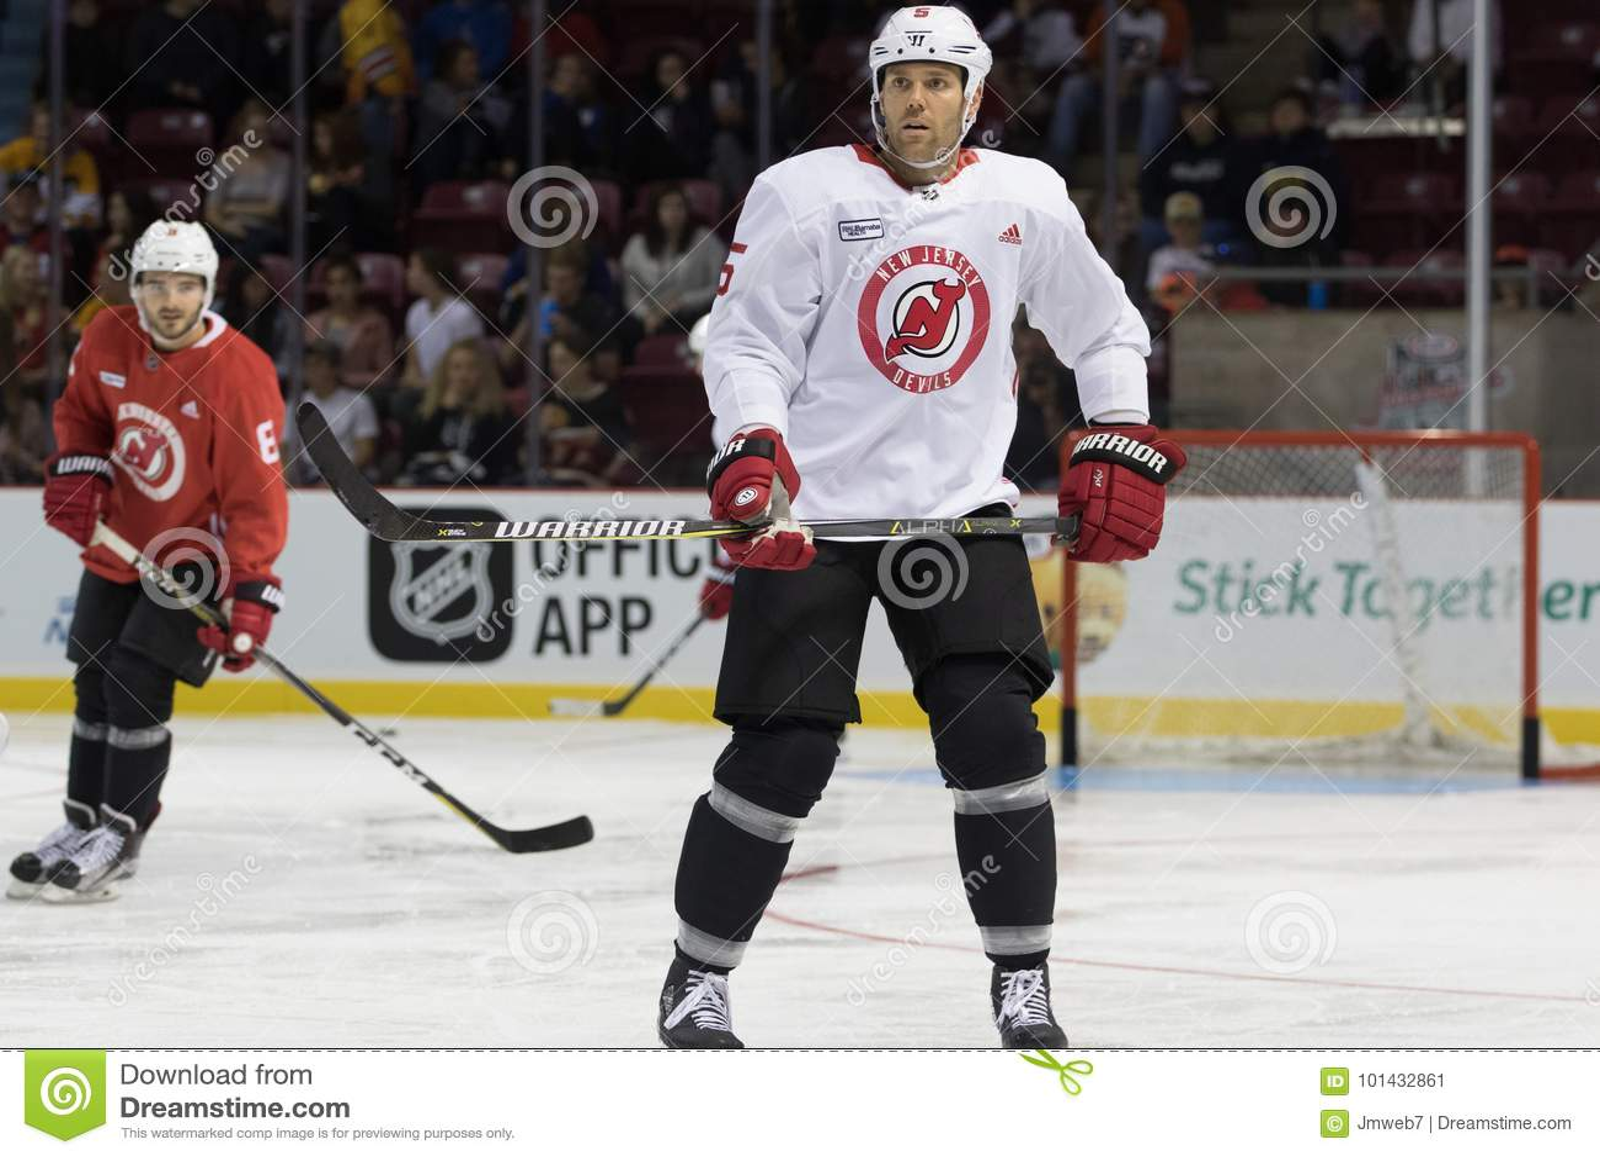 buy popular 5d324 e150d New Jersey Devils Hockey Player Dalton Prout Editorial Photo ...